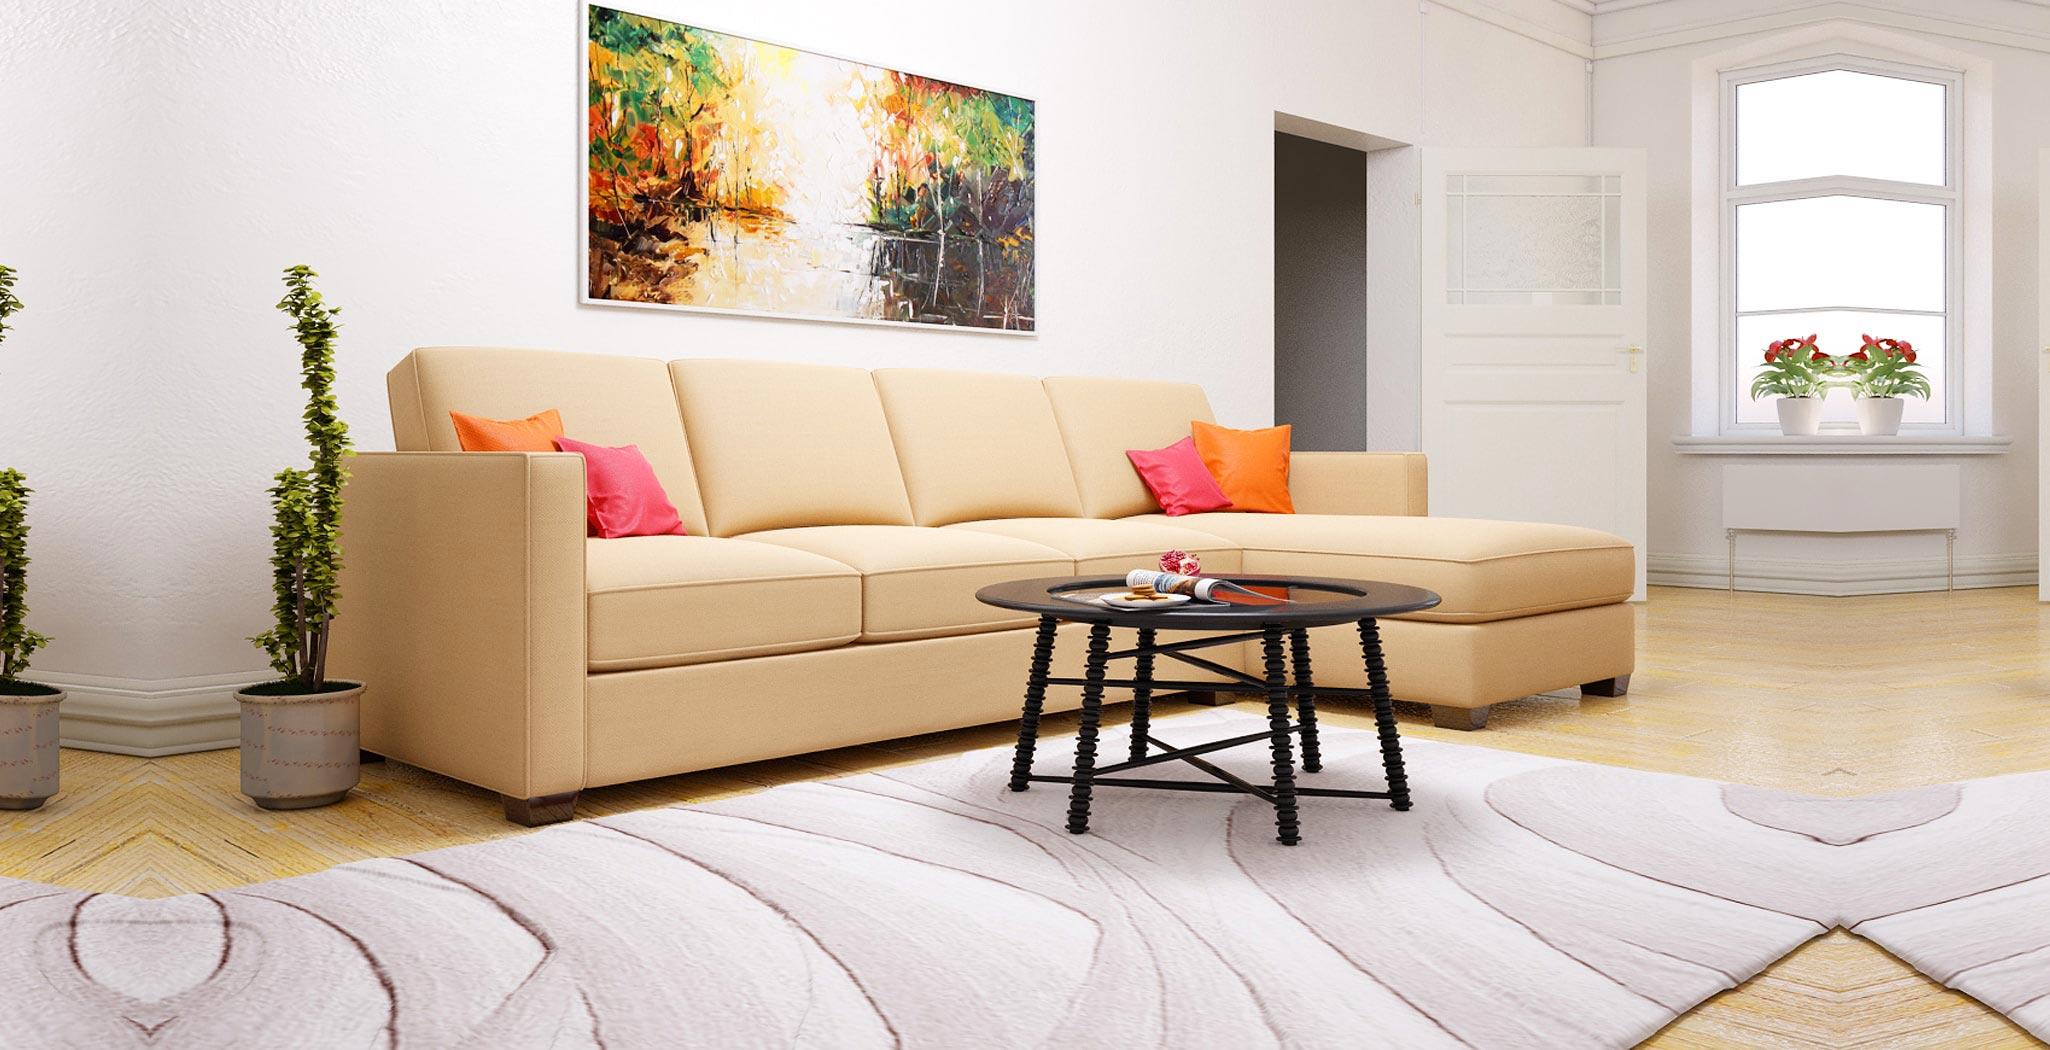 calgary panel furniture gallery 4